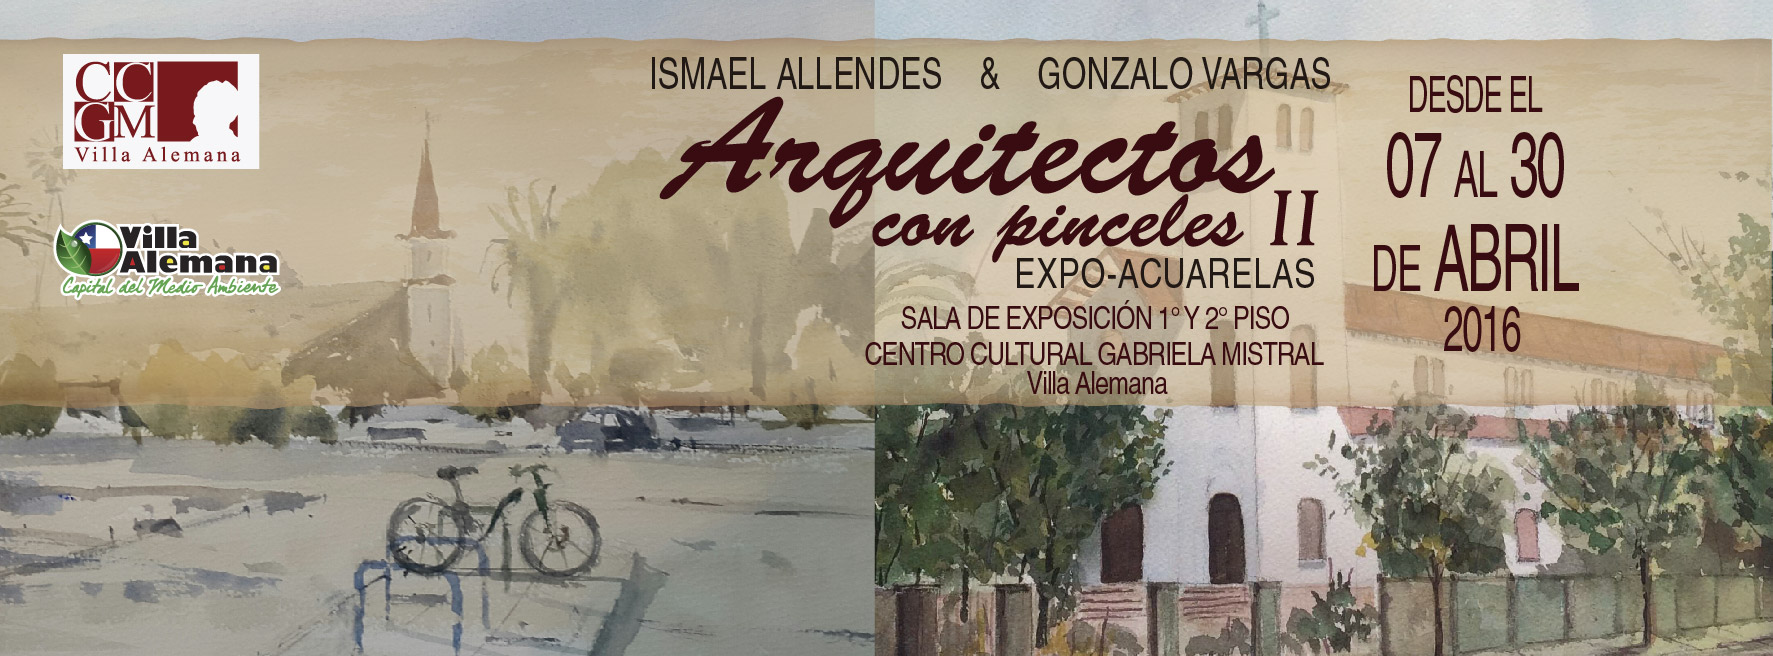 Expo-Acuarelas